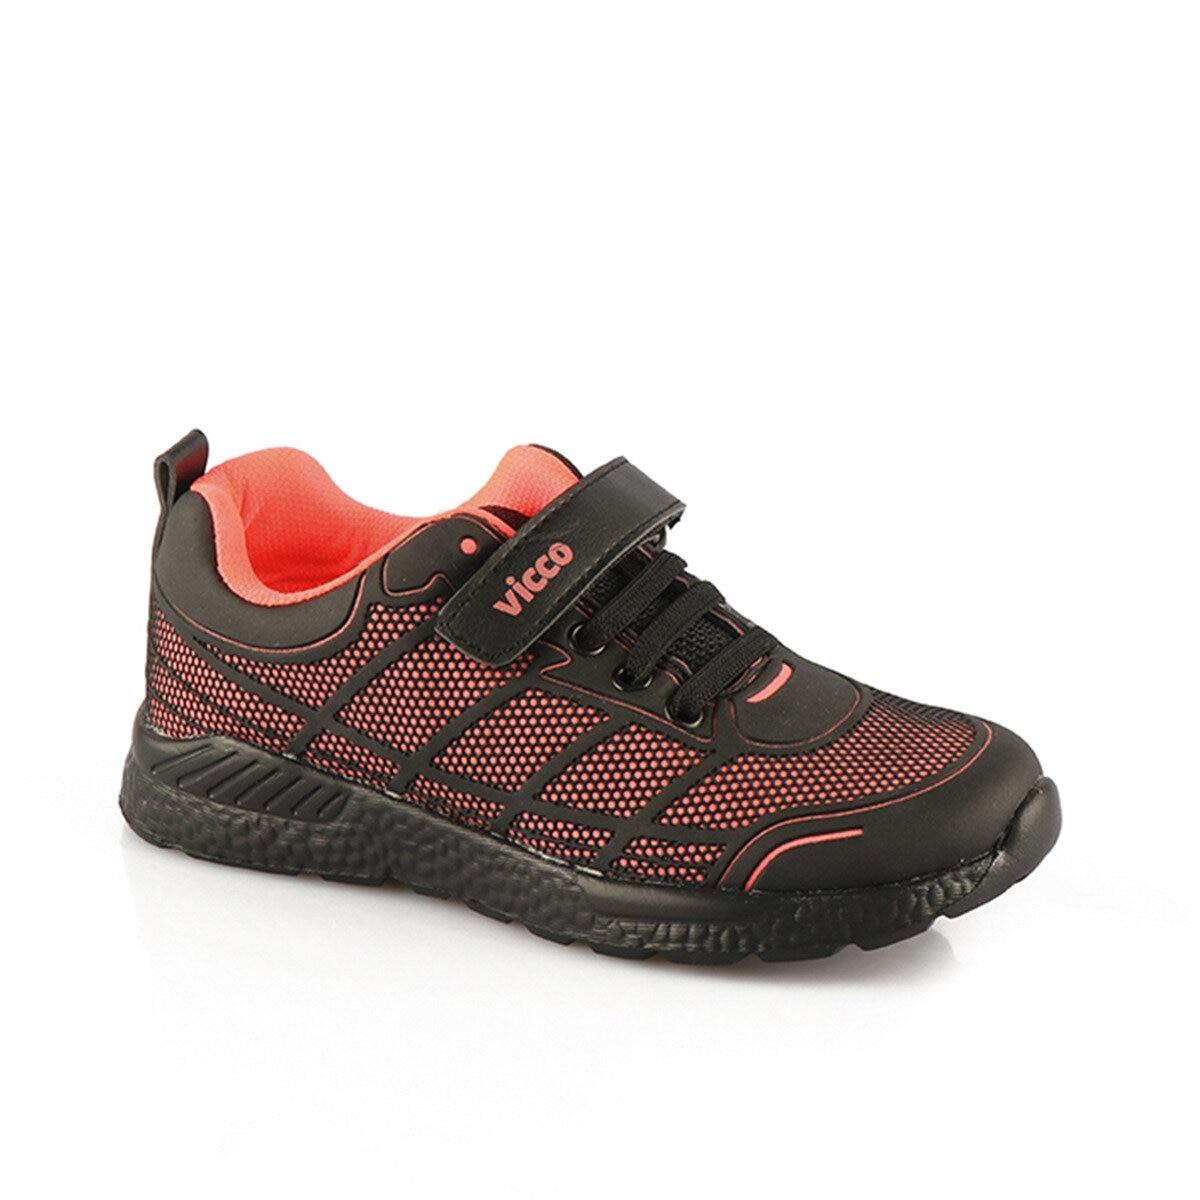 FLO 347.18K.123 Black Female Child Sneaker Shoes VICCO